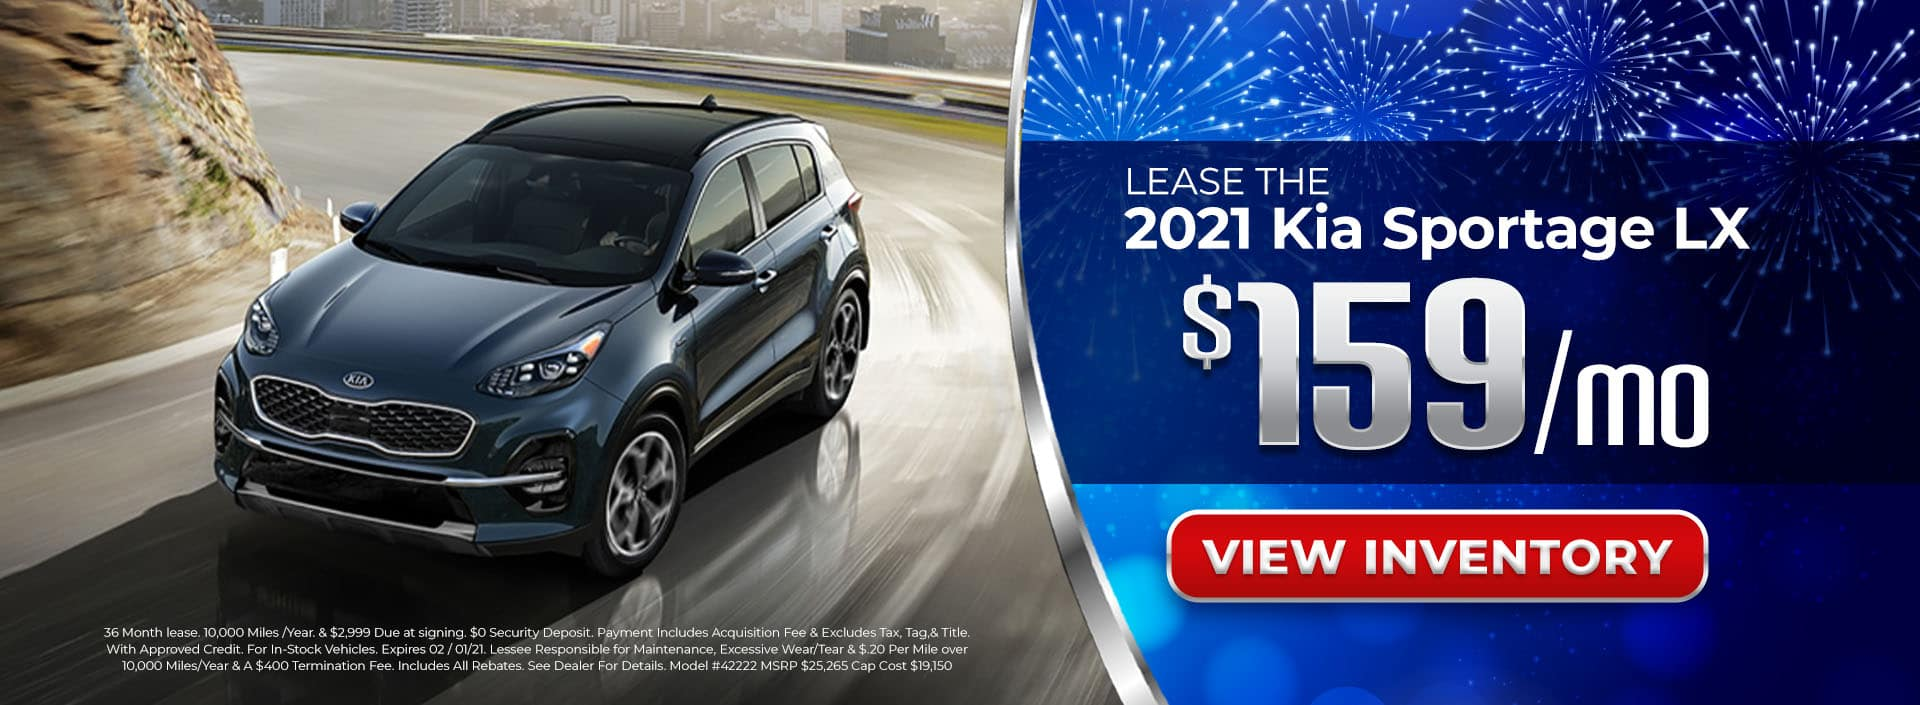 Lease 2021 Kia Sportage for $159/mo in Atlanta, GA